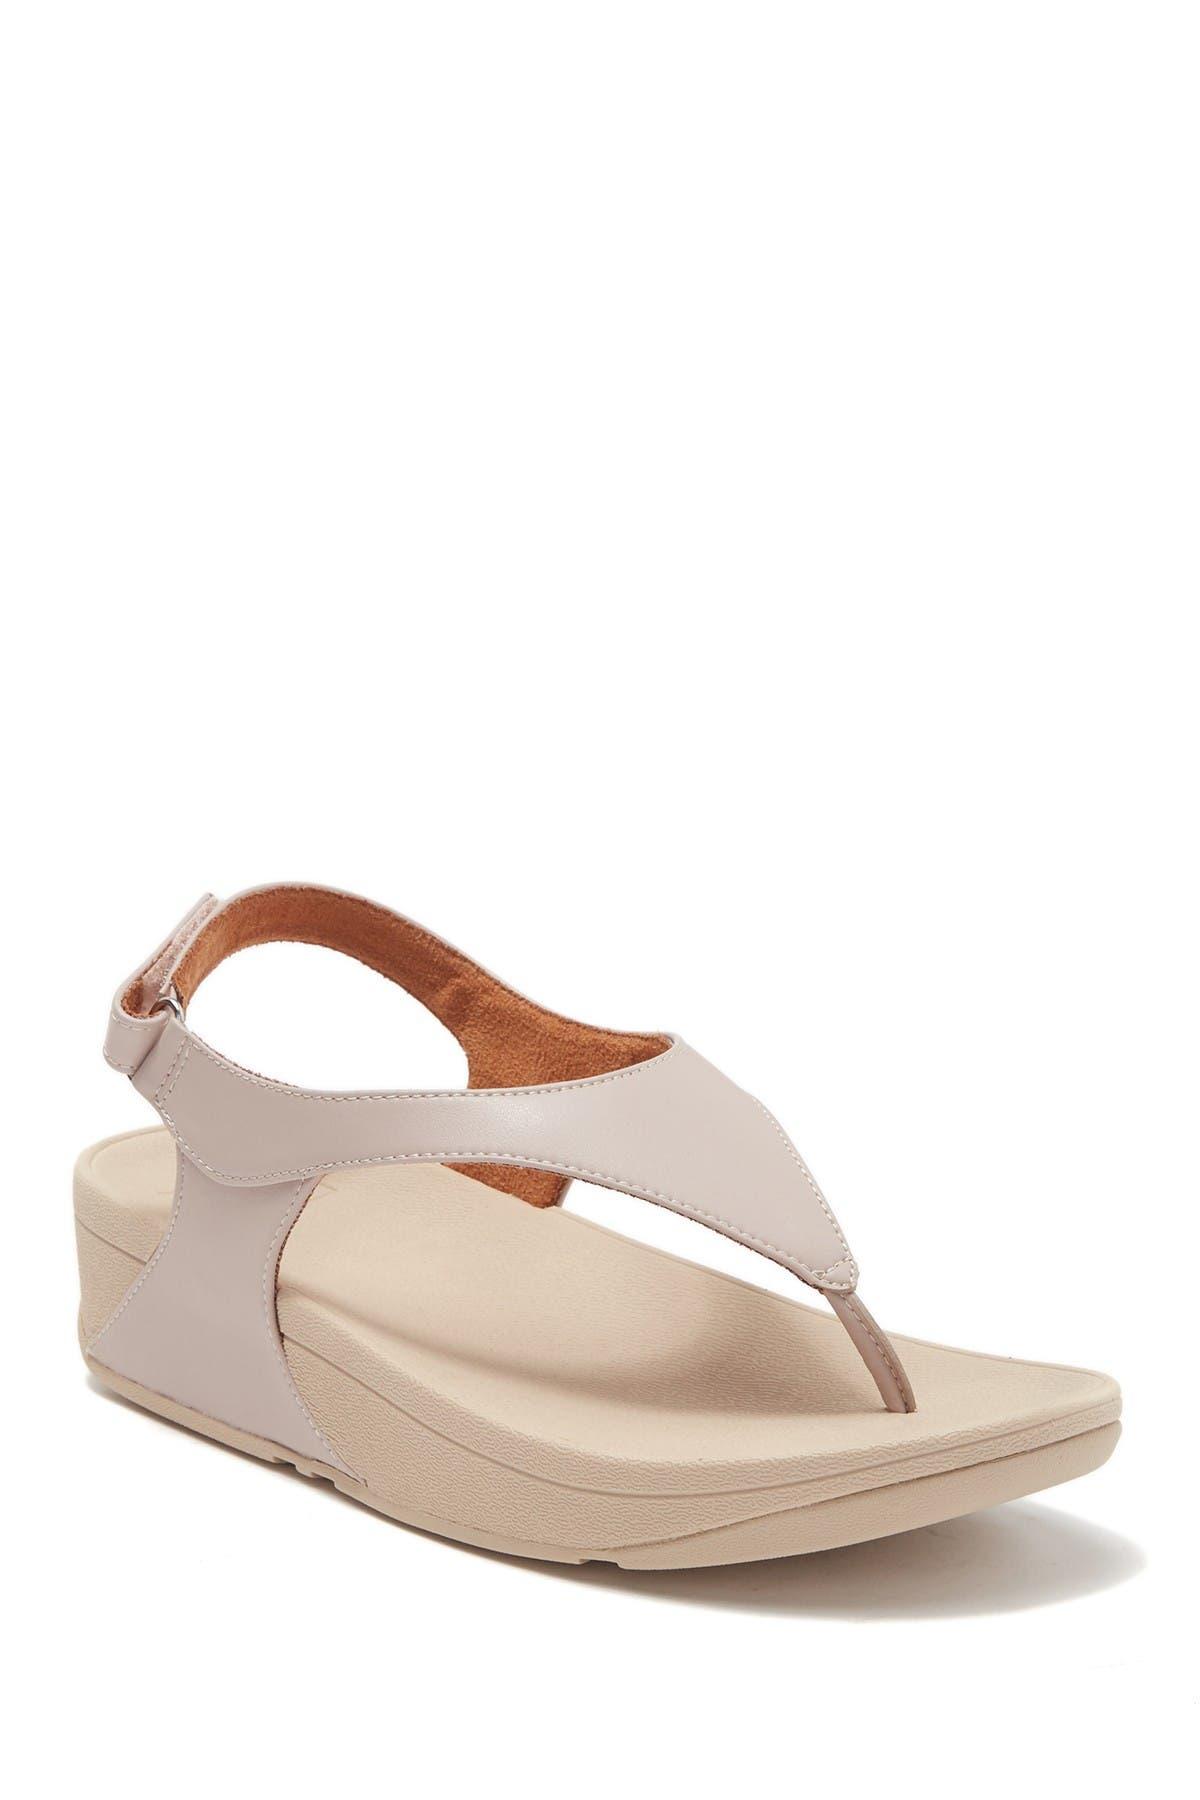 Fitflop | Skylar Wedge Sandal